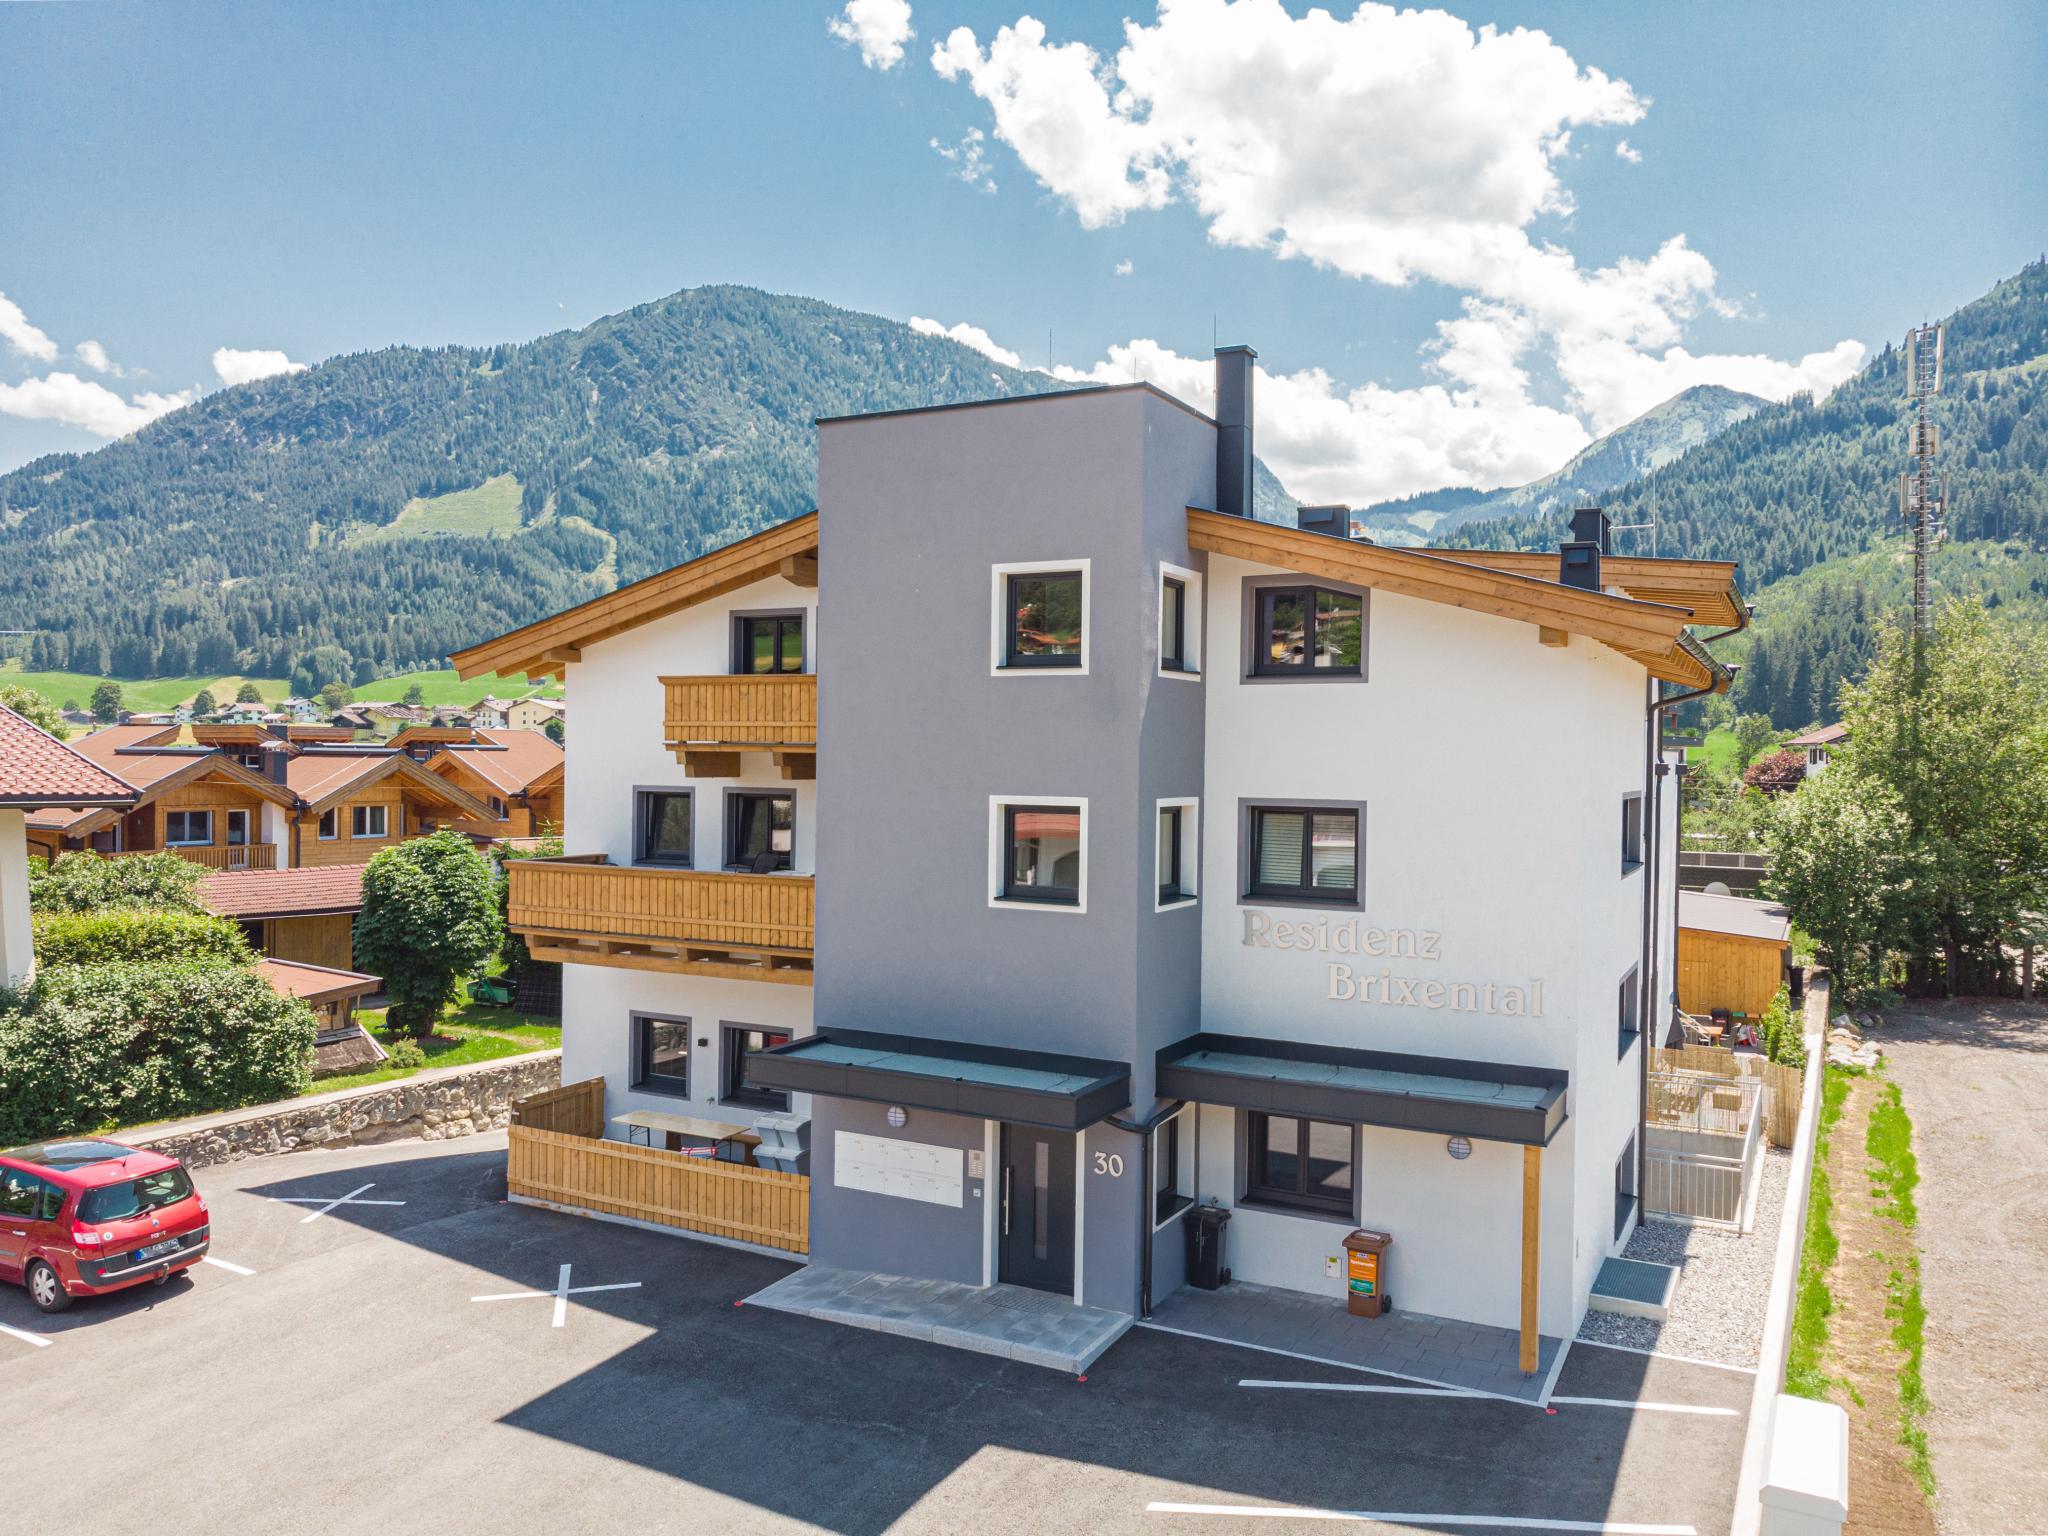 Residenz Brixental Top 4 Tirol